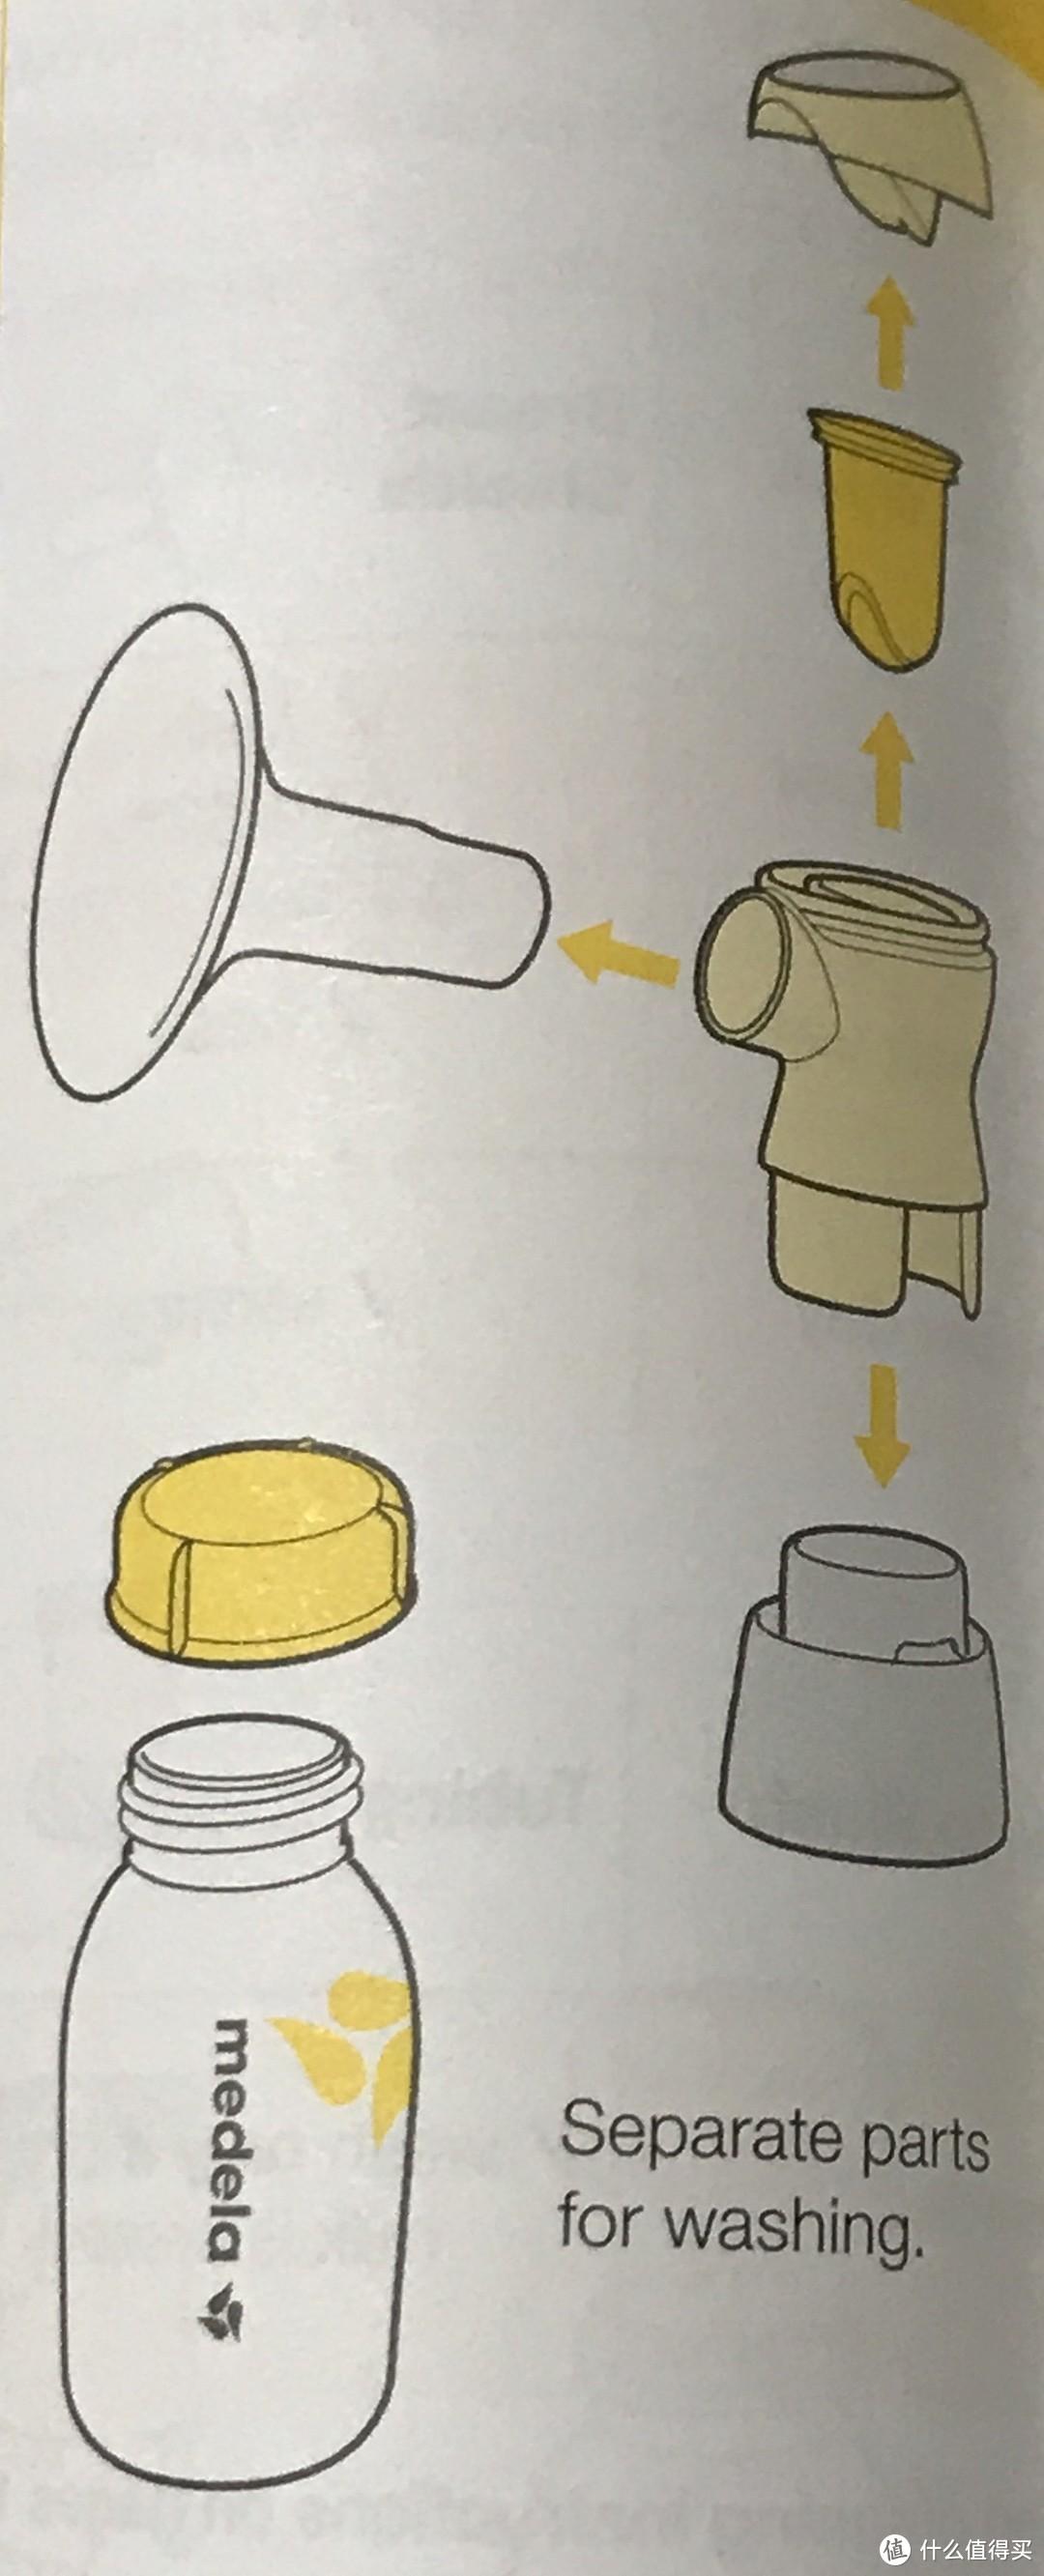 Medela 美德乐 致韵 智能电动吸奶器开箱及使用初感